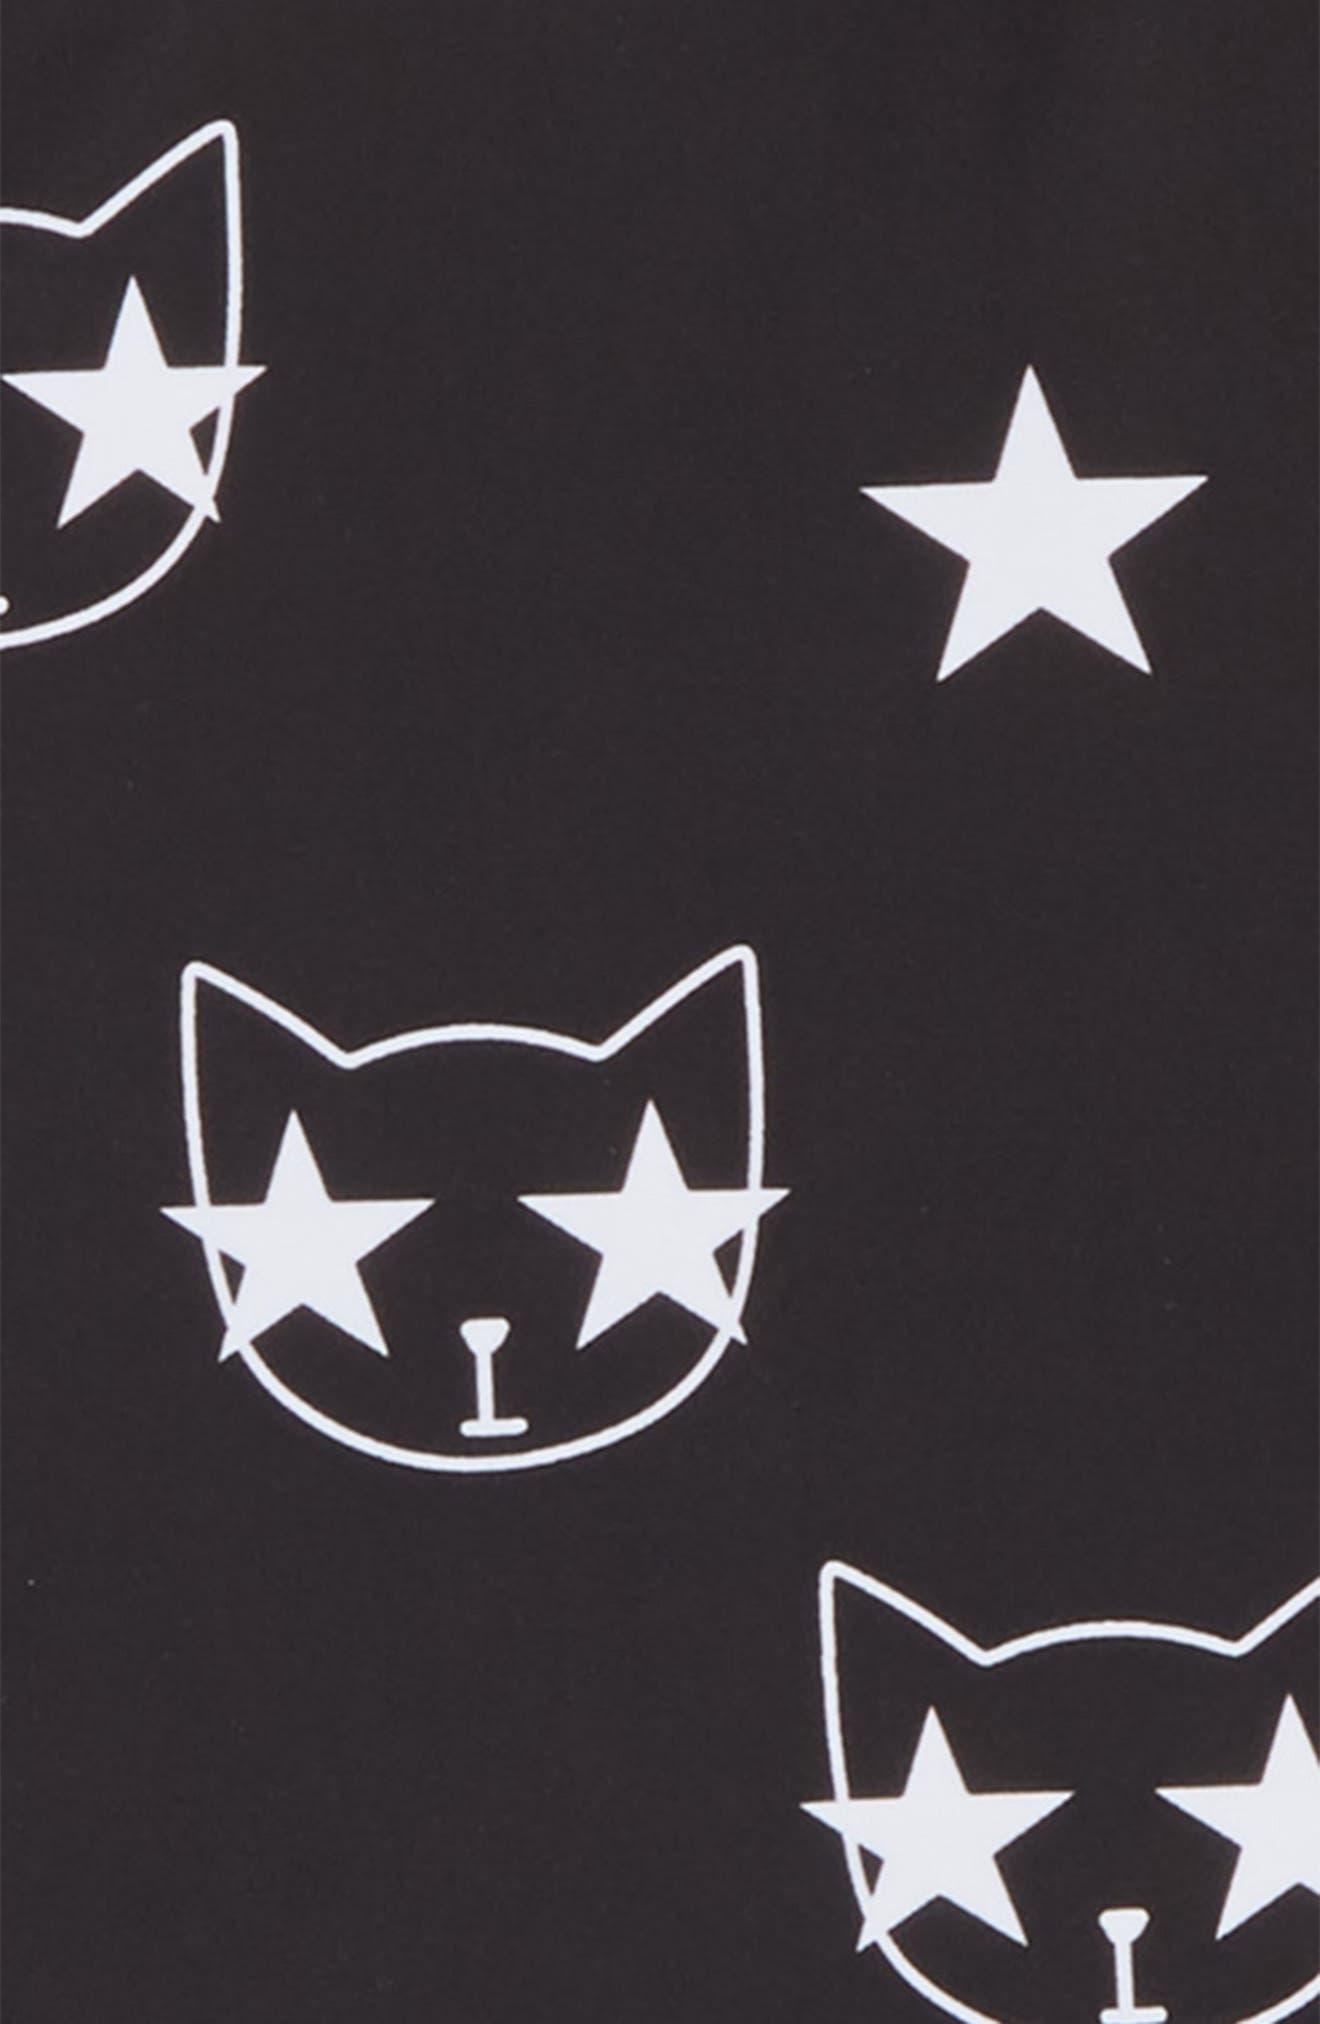 Starcat Two-Piece Rashguard Swimsuit,                             Alternate thumbnail 3, color,                             001